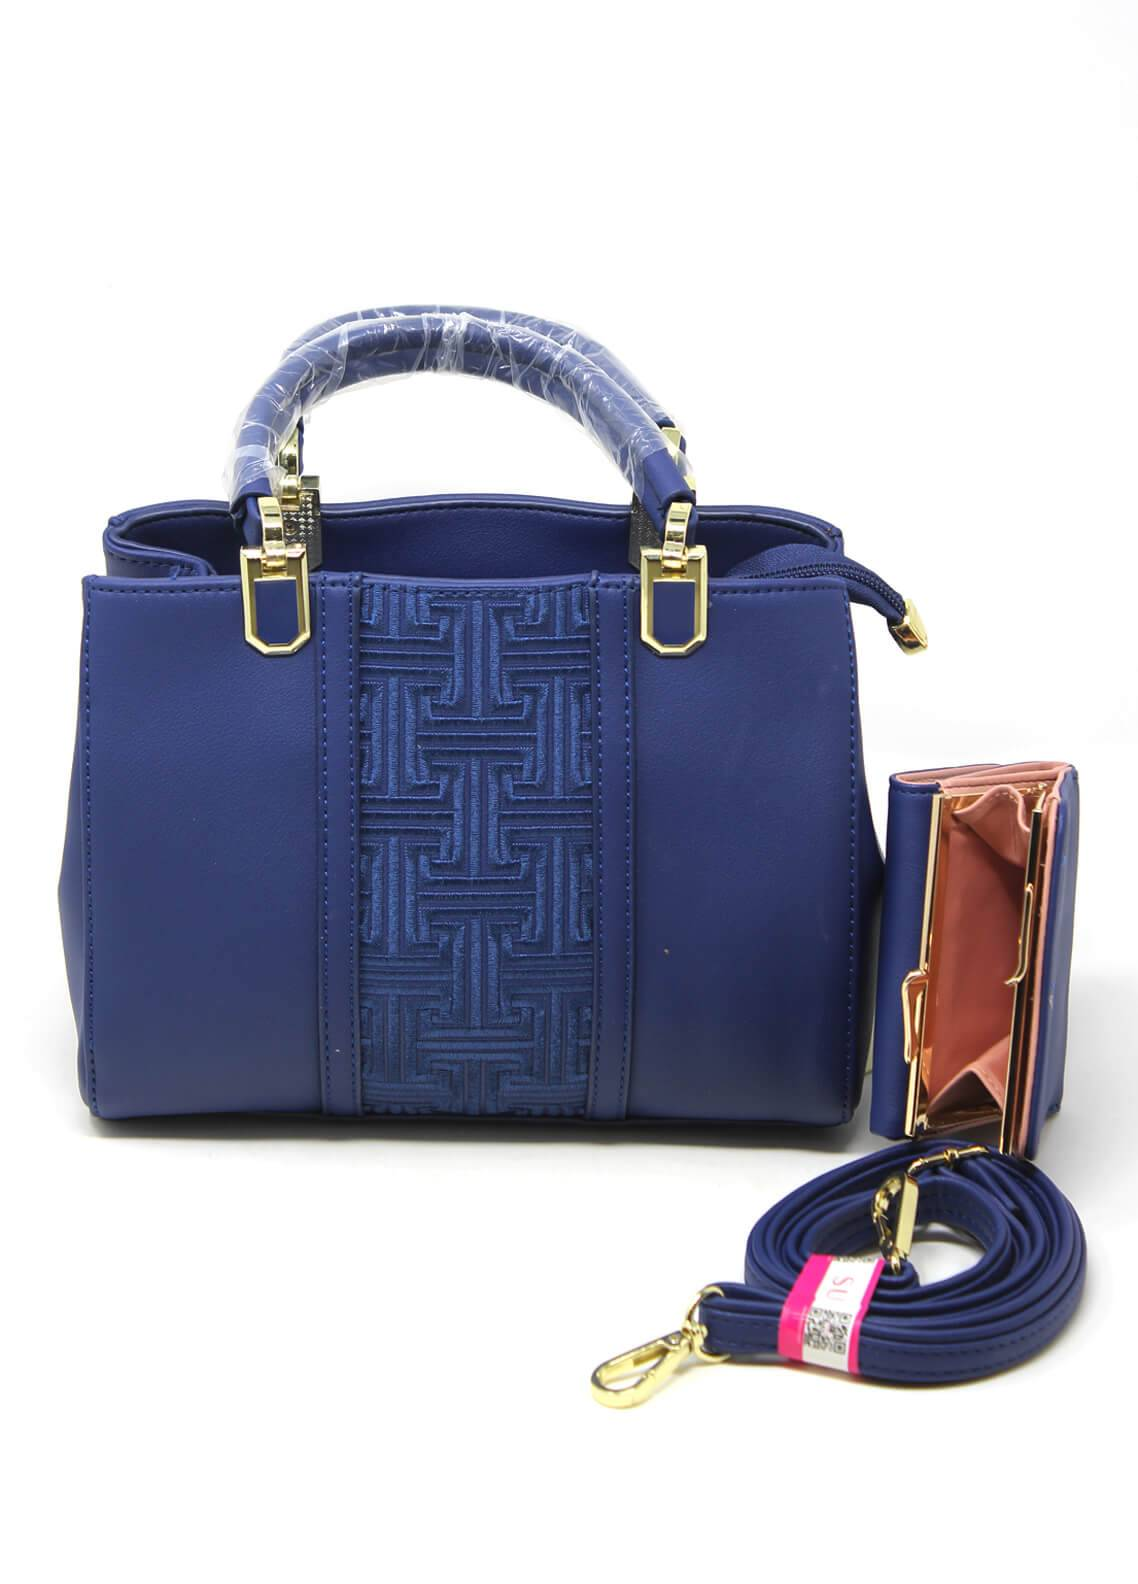 Susen PU Leather Satchels Bag for Women - Royal Blue with Plain Texture